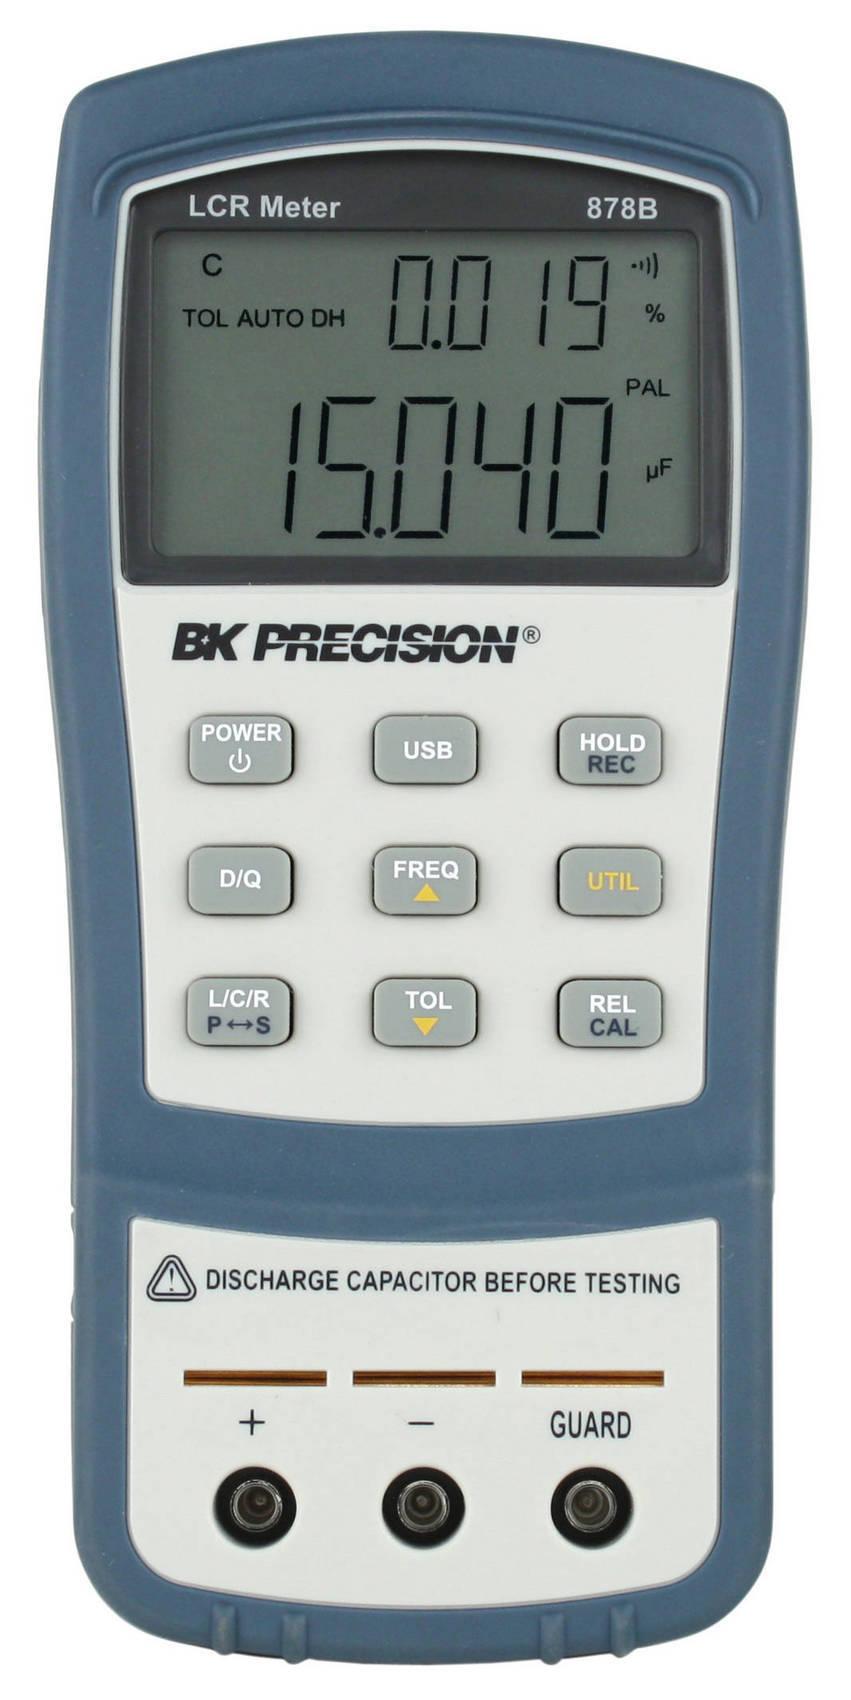 Fluke Lcr Meter : B k precision upgrades handheld lcr meters